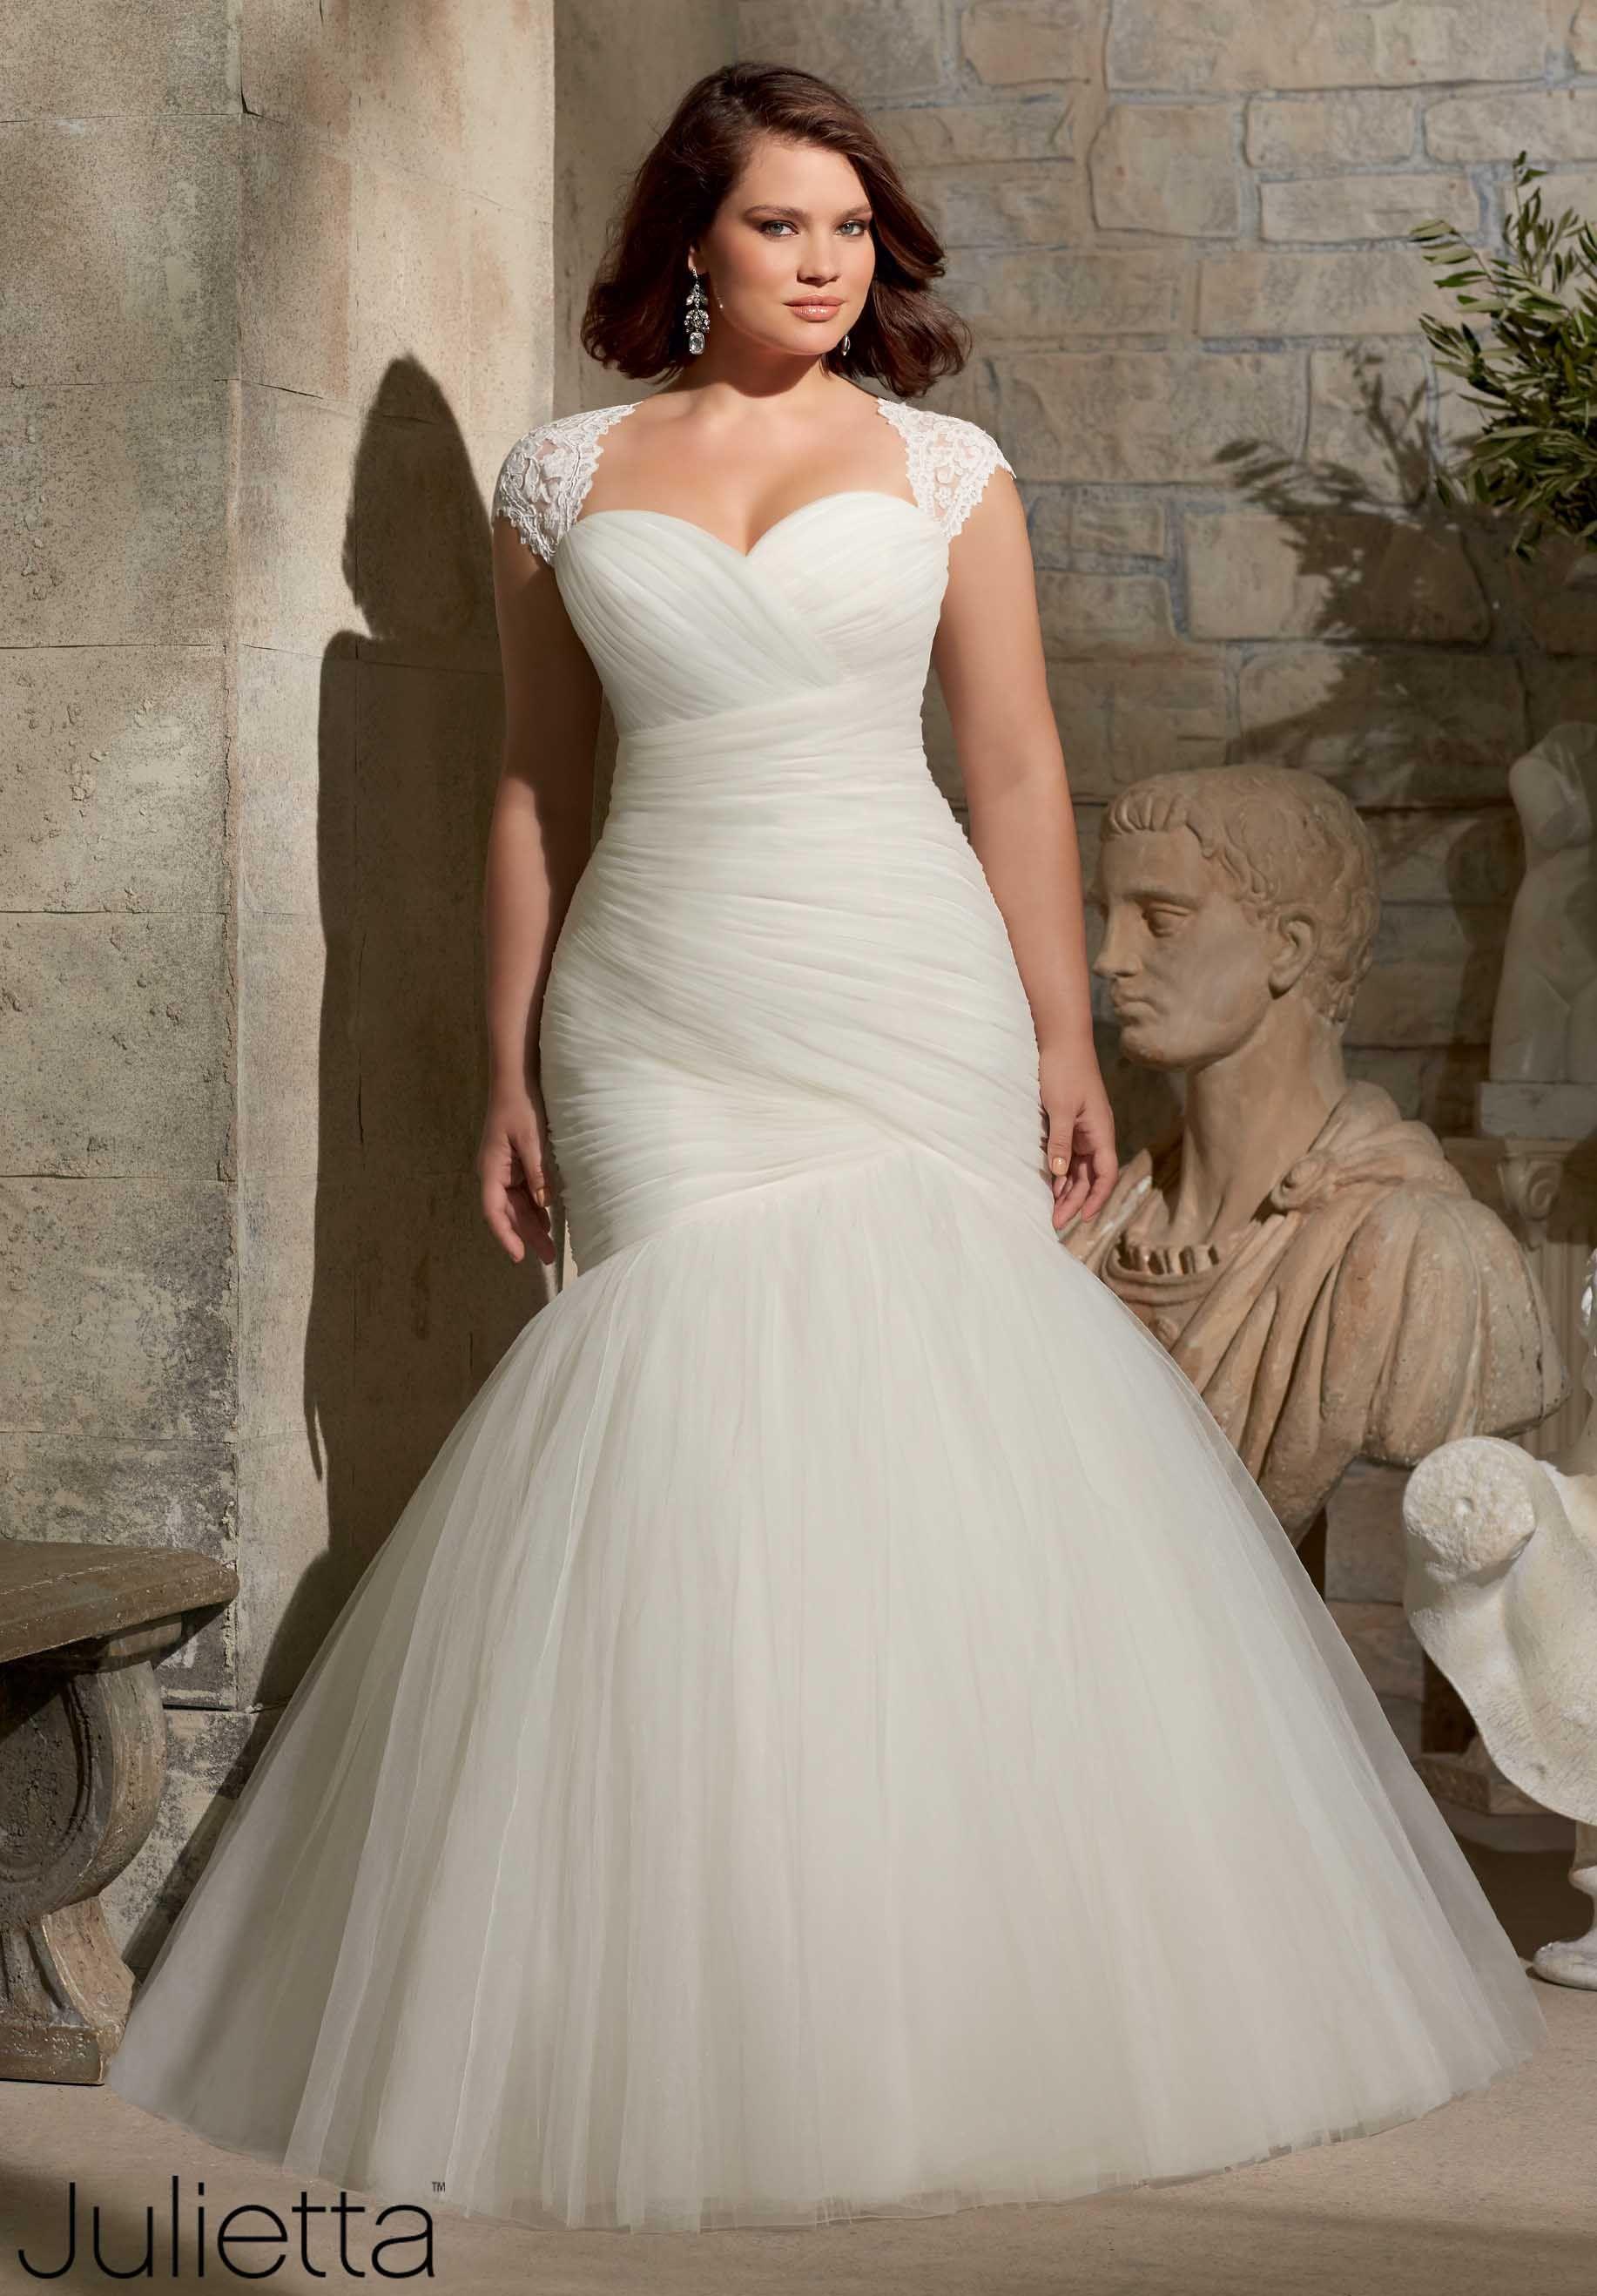 Vestidos de novia p gorditas